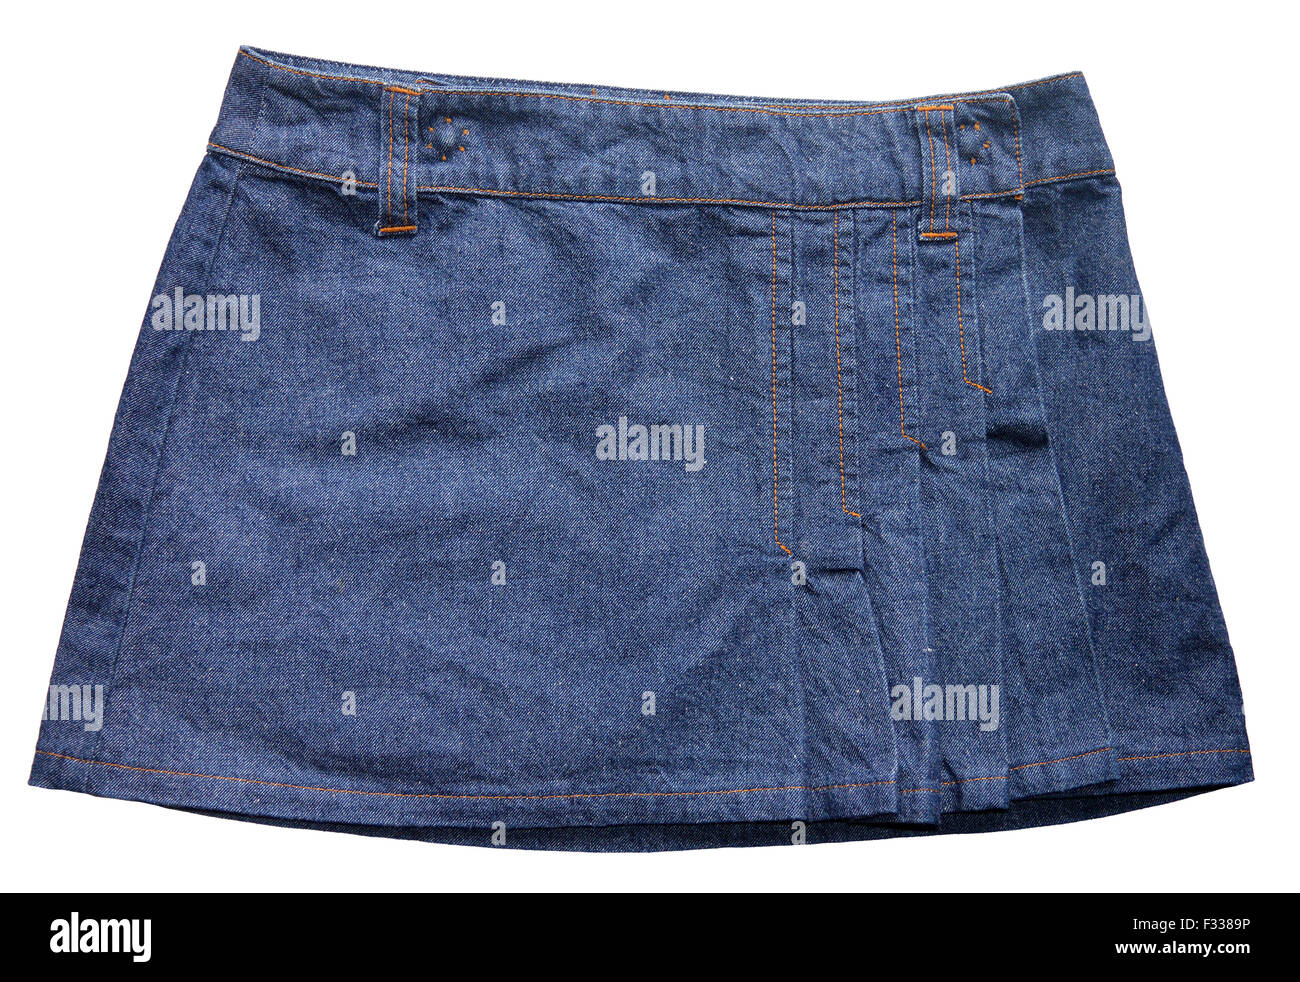 Blue denim skirts - Stock Image